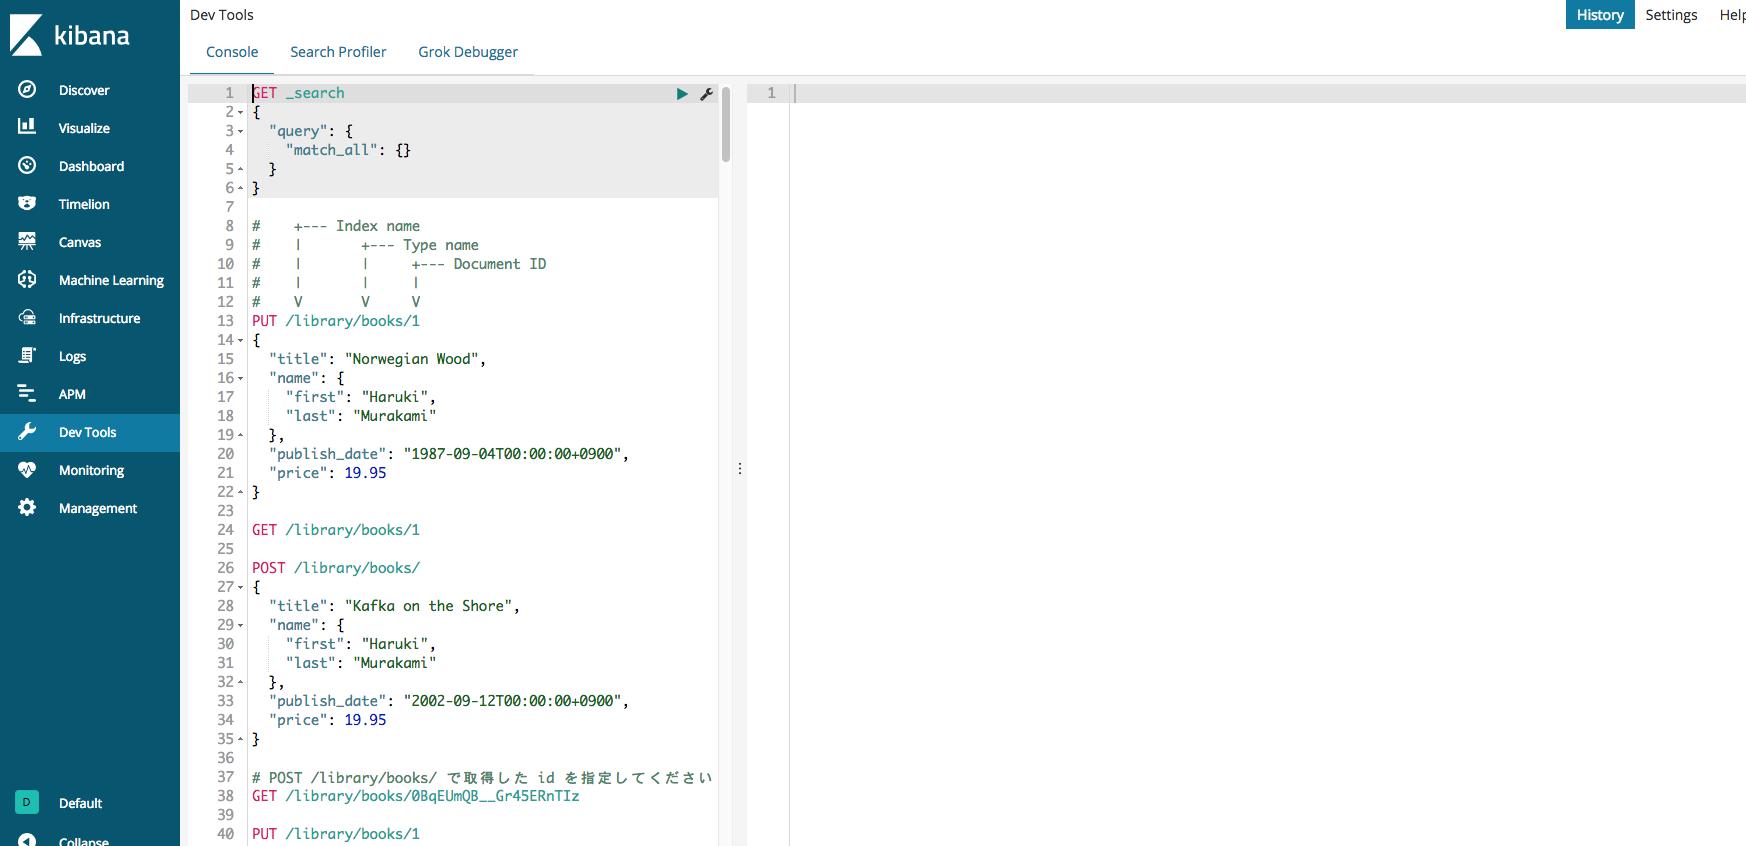 kibana_dev_tools_6_5_0.png